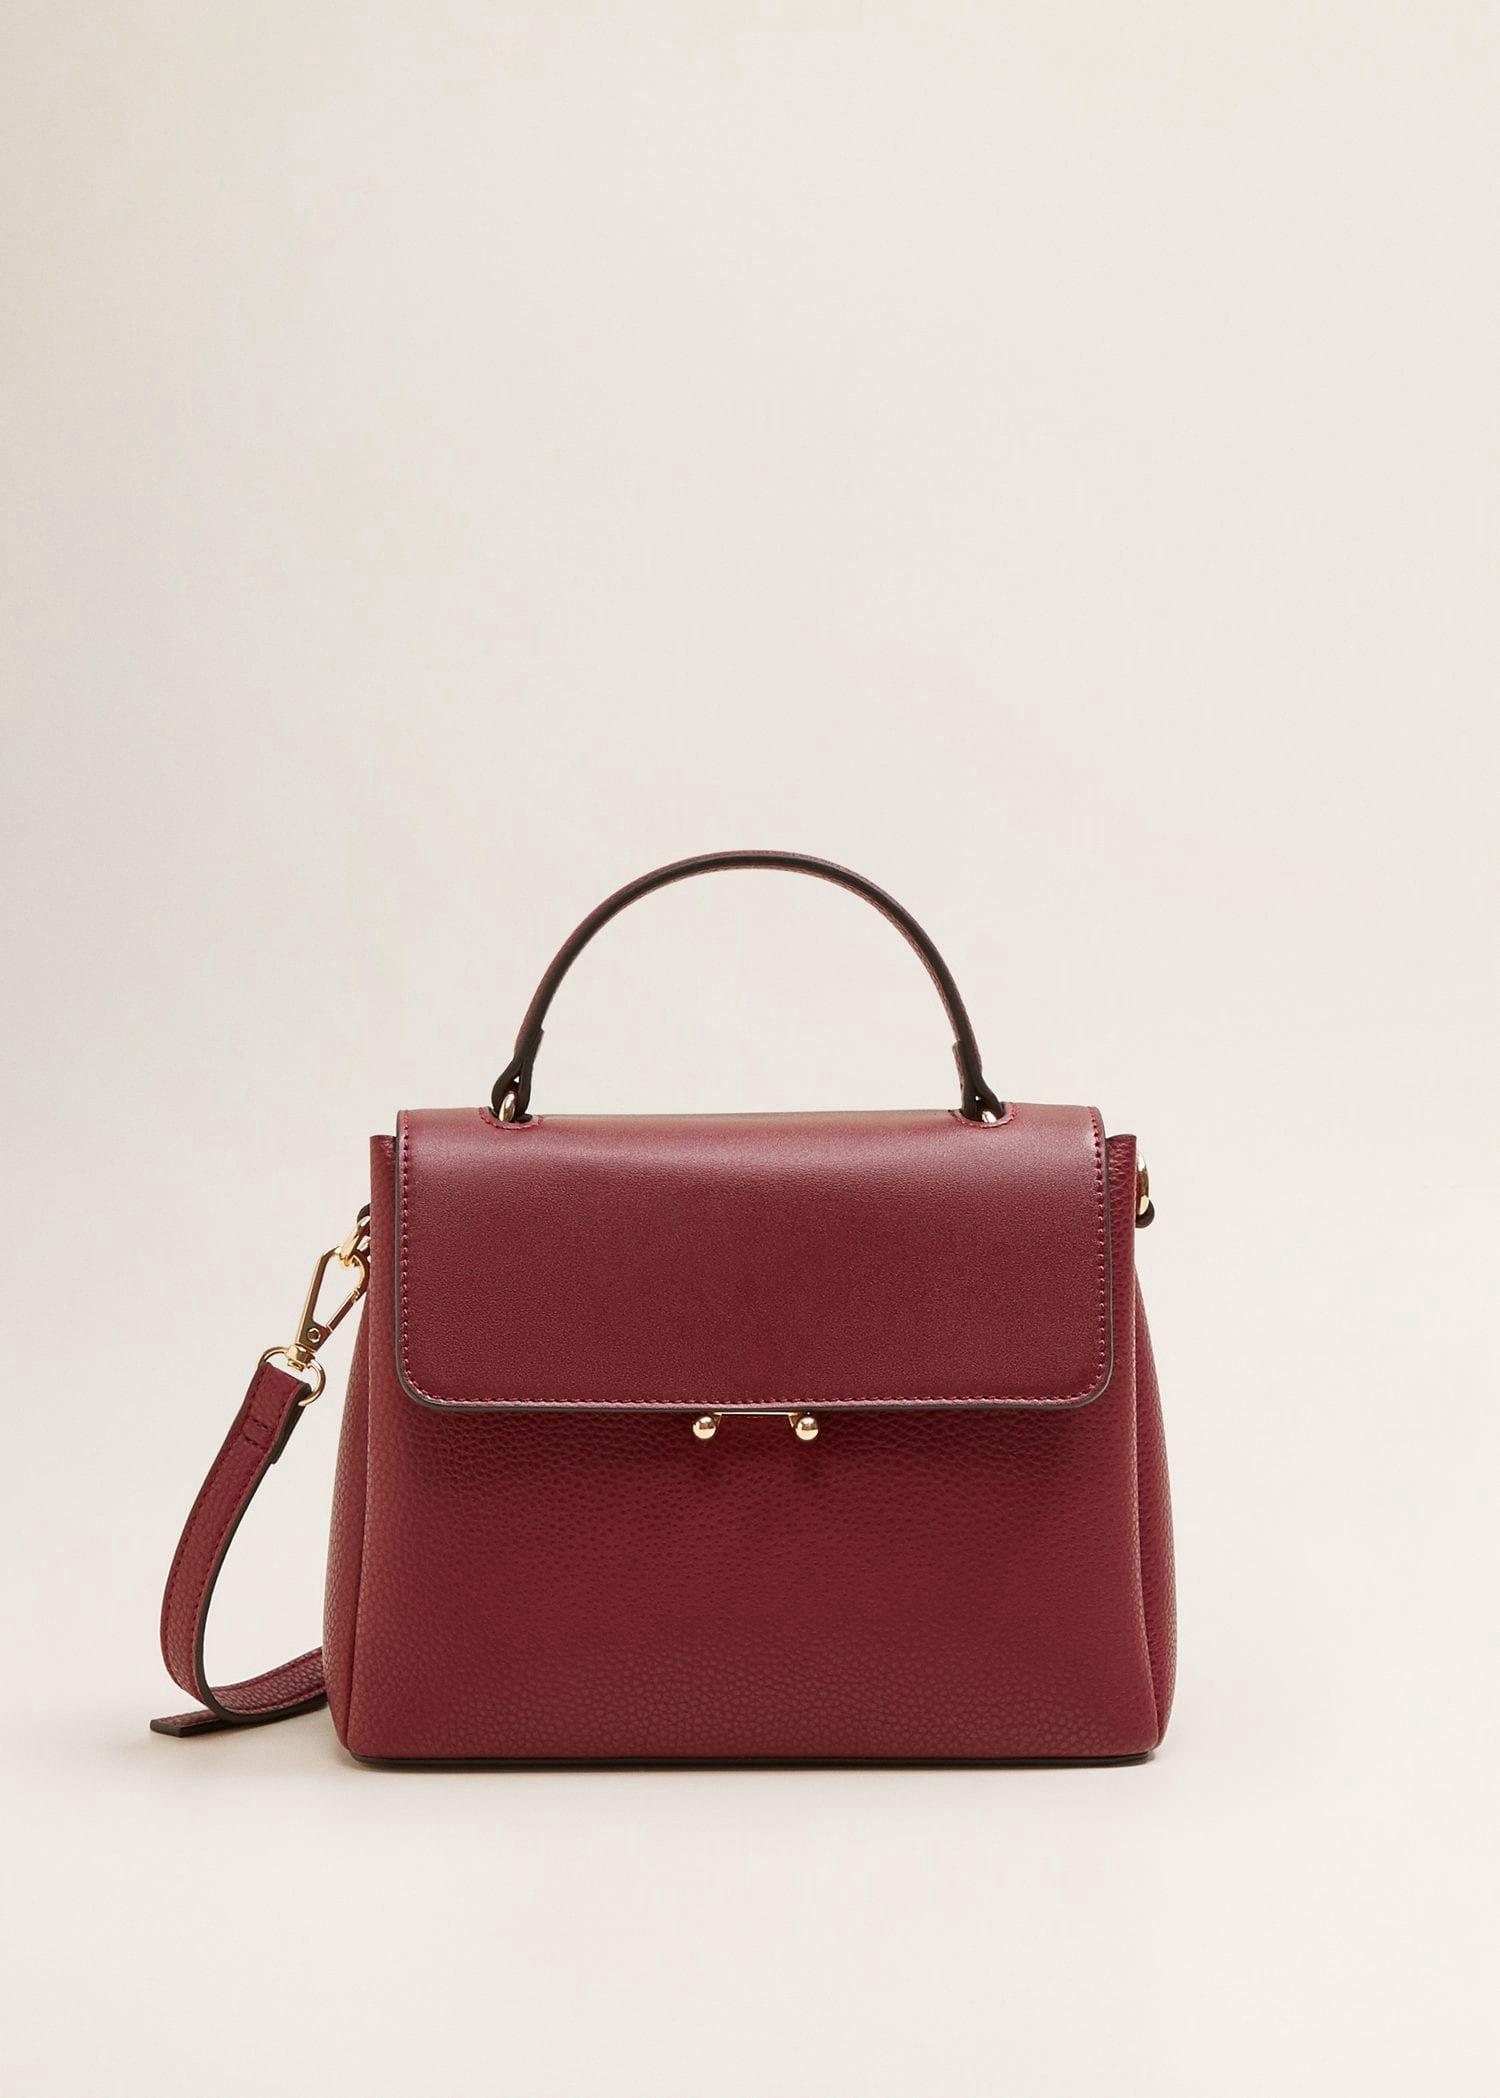 4fd96255c01cd Mango Flap Cross-Body Bag - Burgundy One Size in 2019